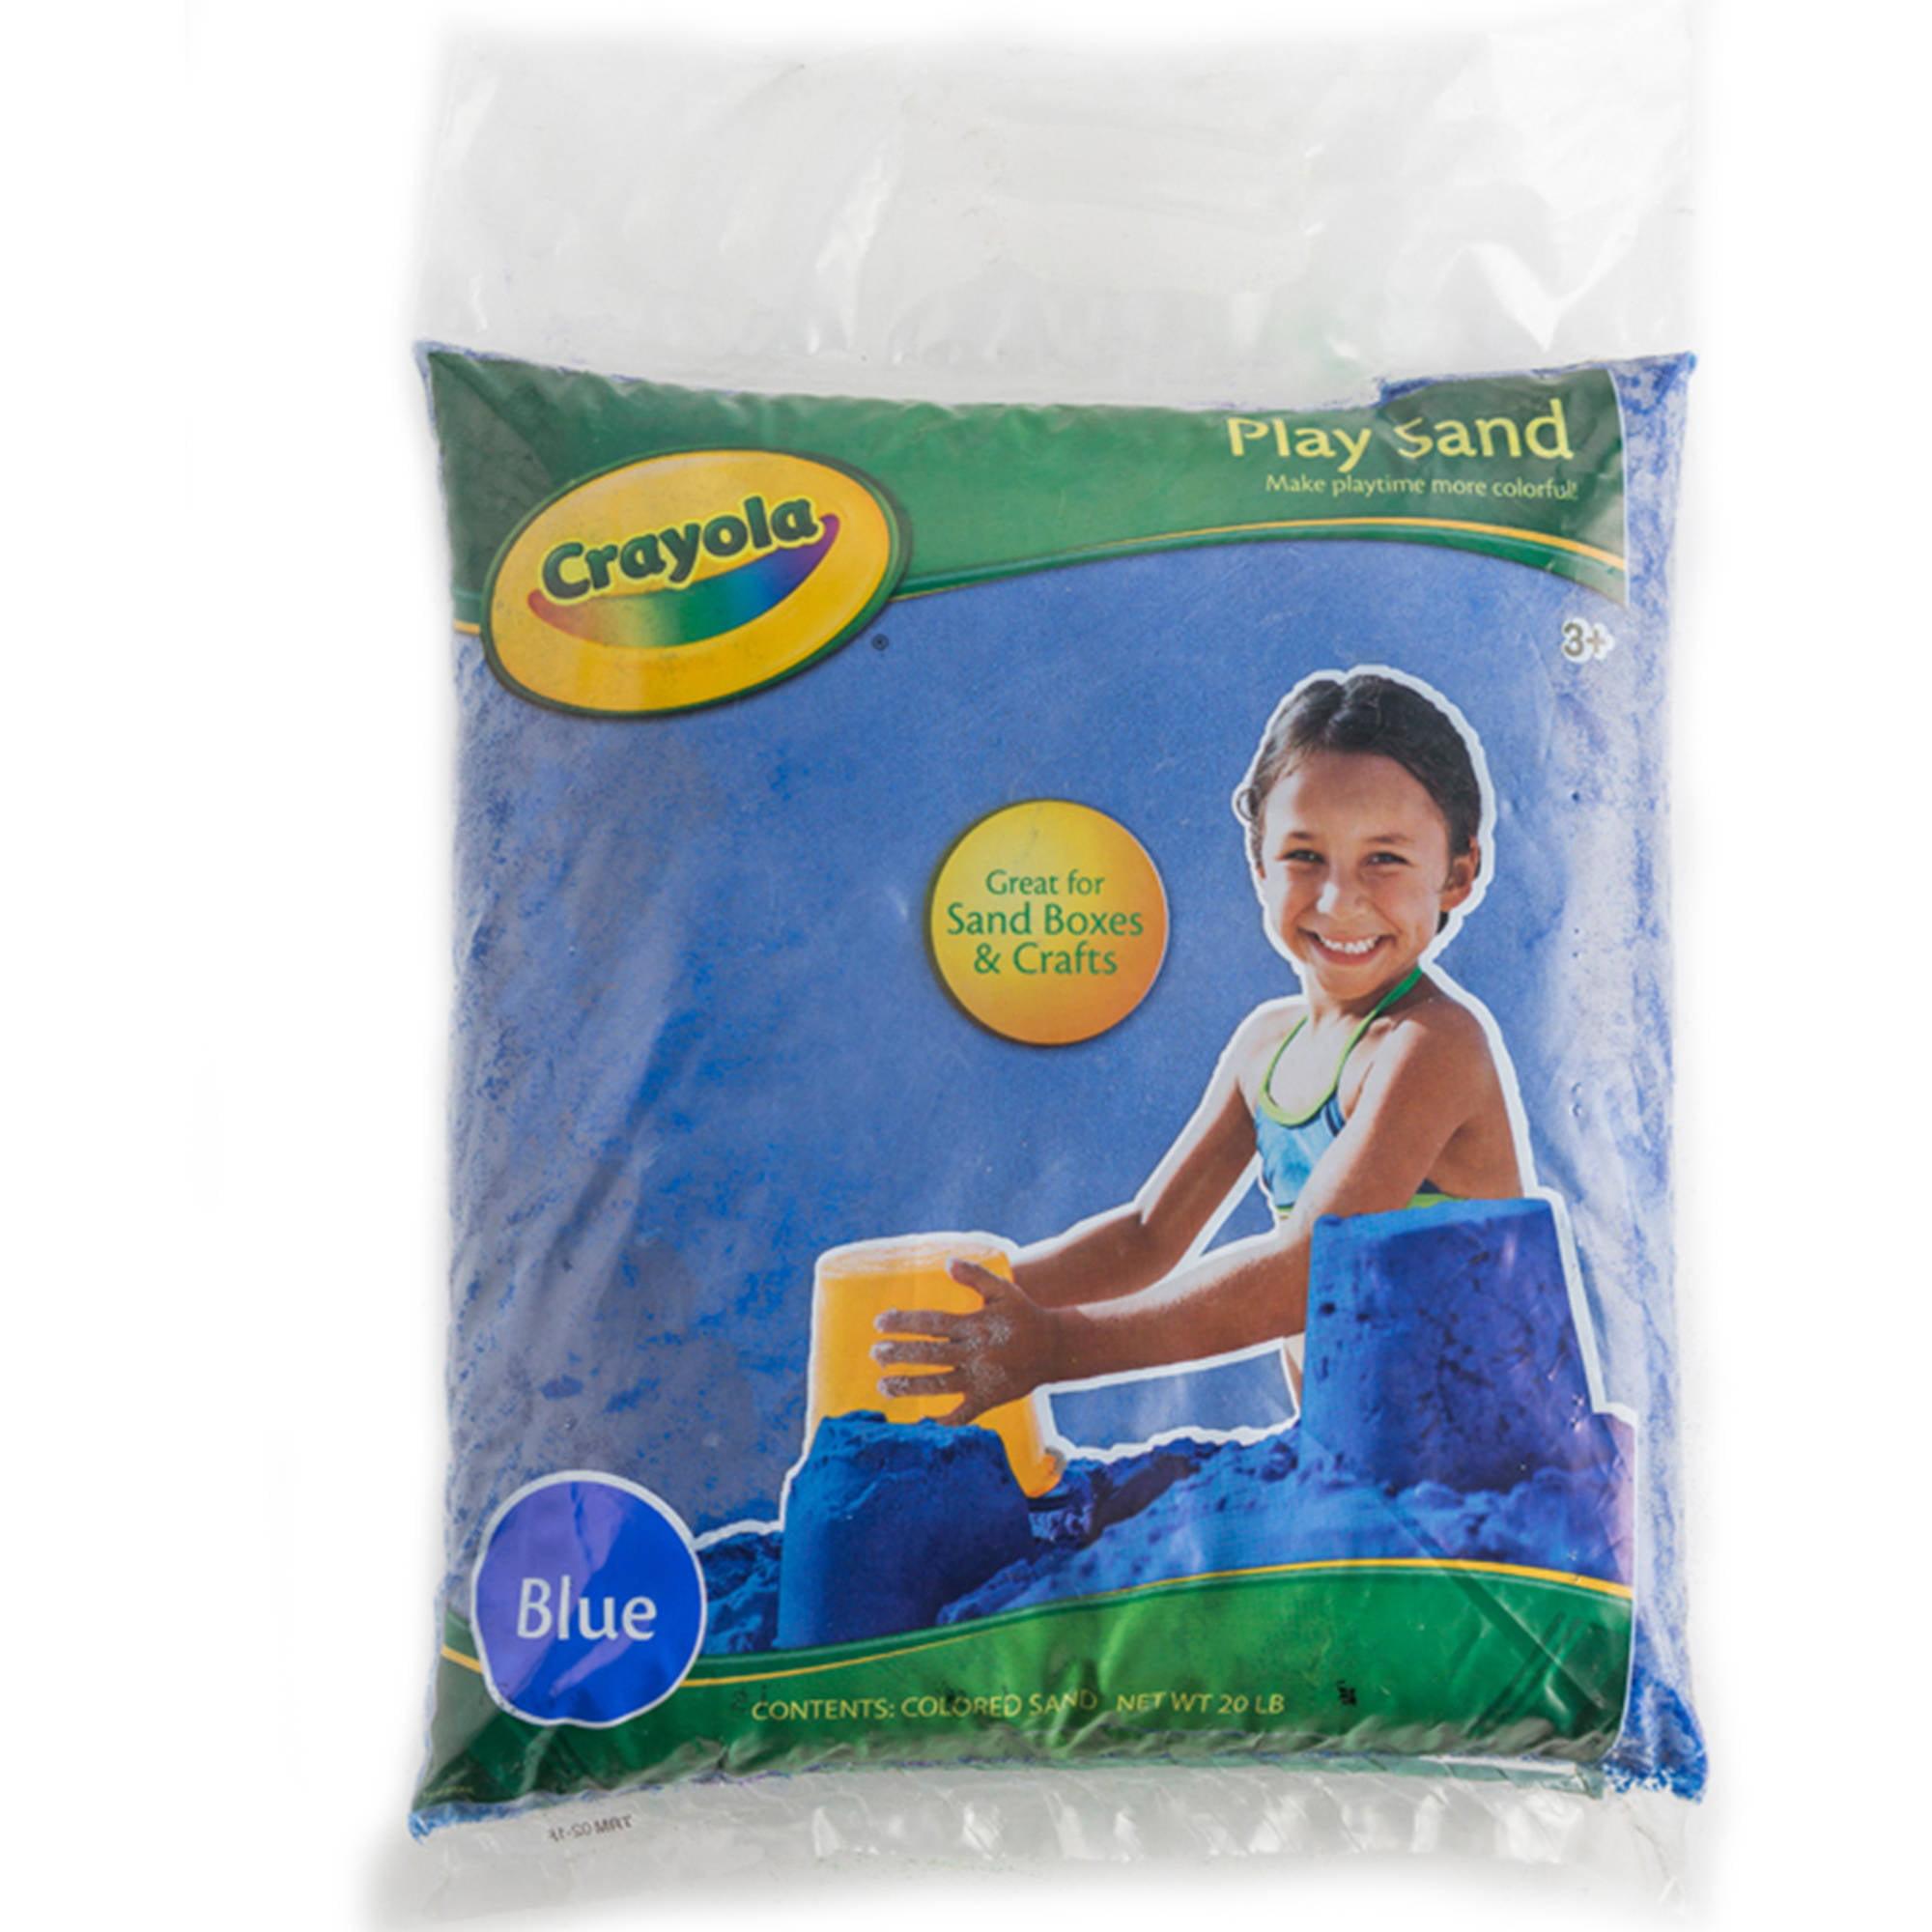 Crayola 20 lb Bag Play Sand - Walmart.com